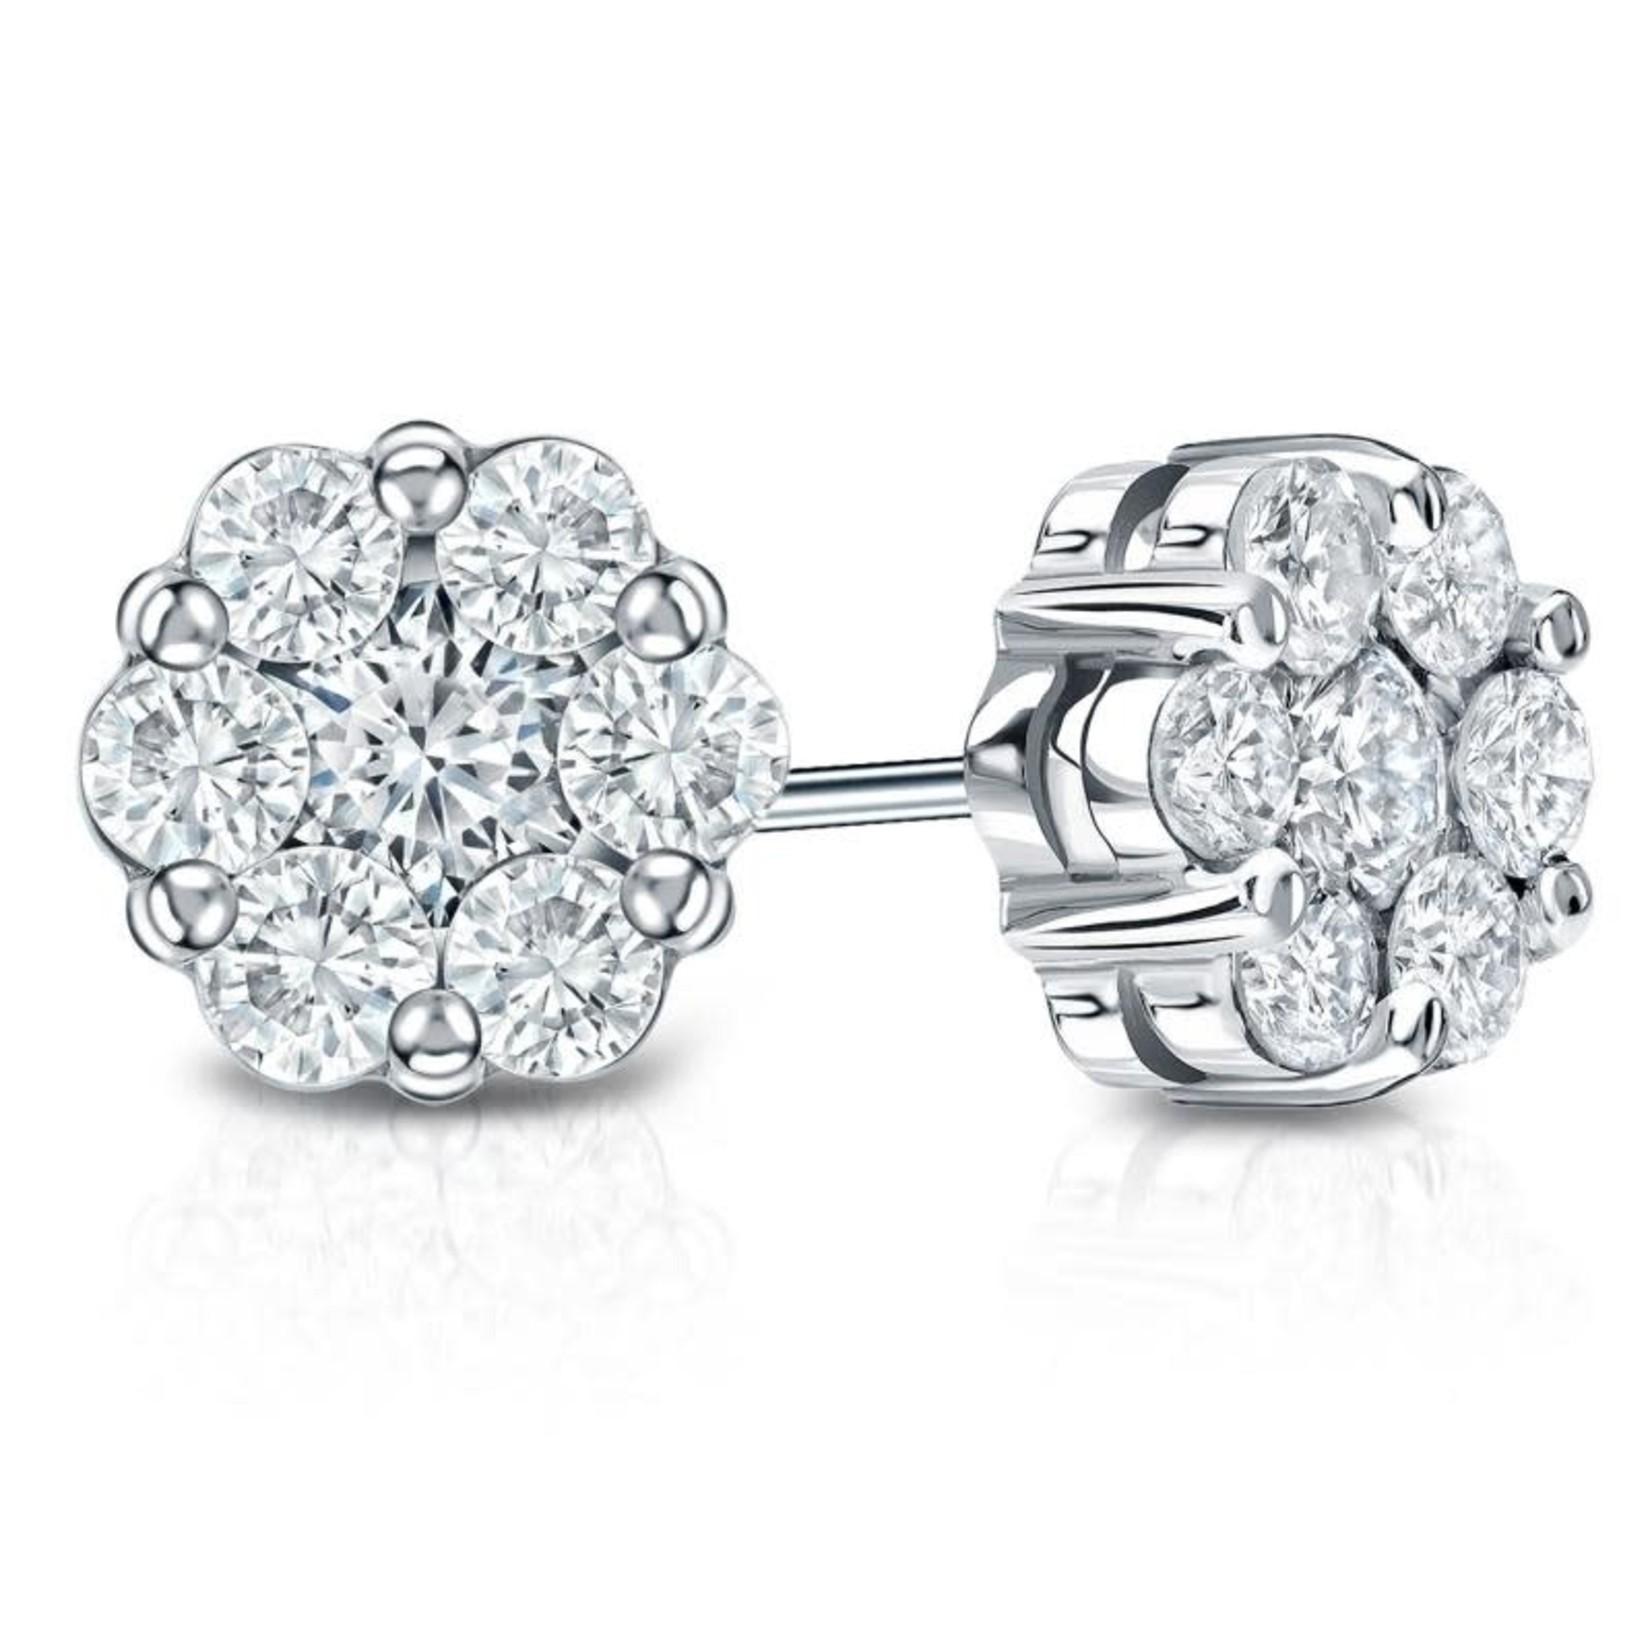 14KW Gold Diamond 0.75ctw Round Cluster Stud Earrings